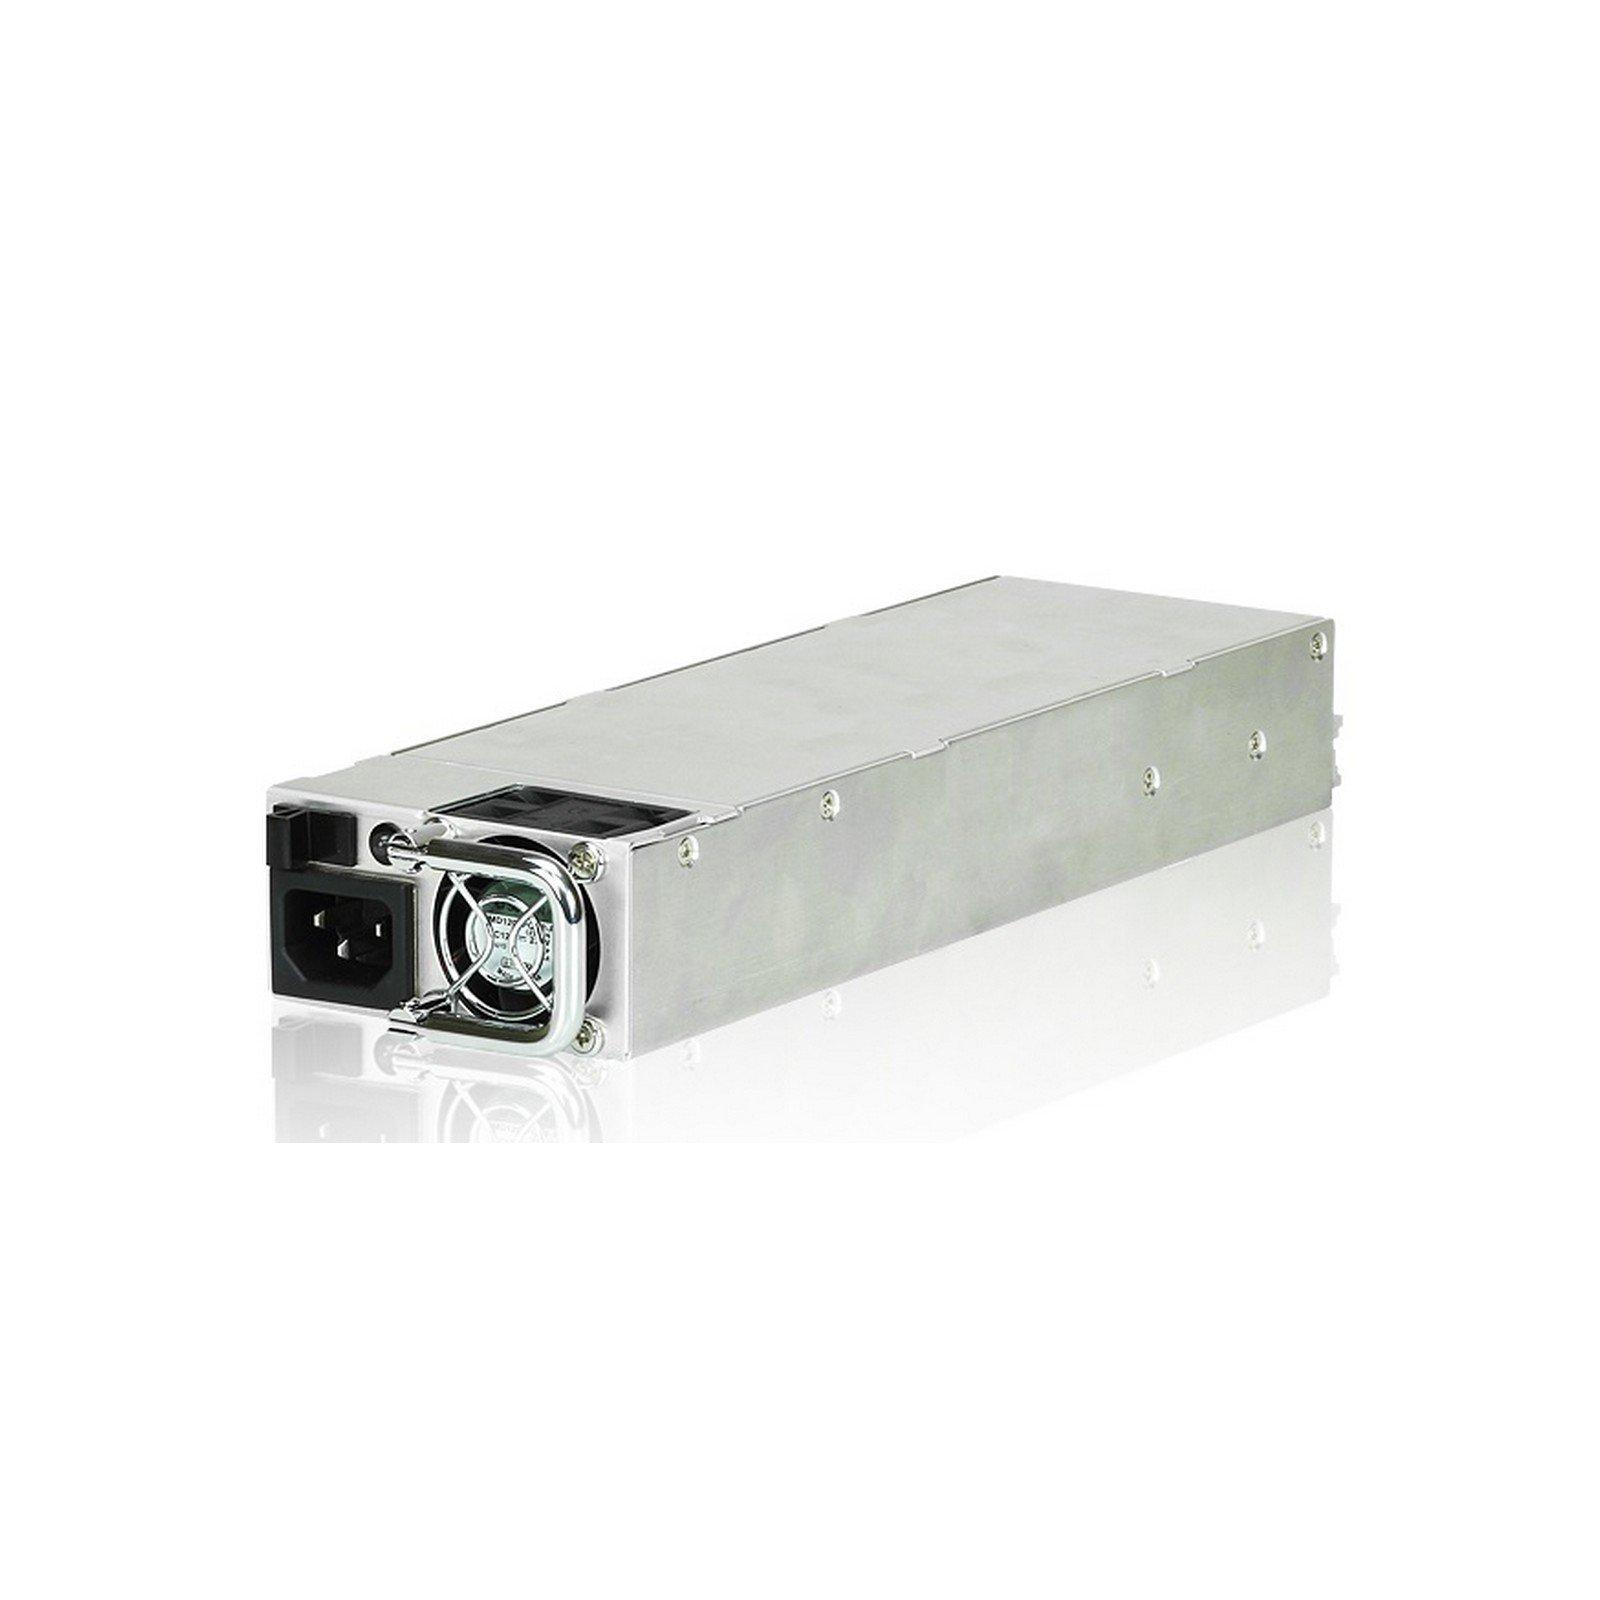 Aten VM-PWR400-A   Power Module Supply for VM1600